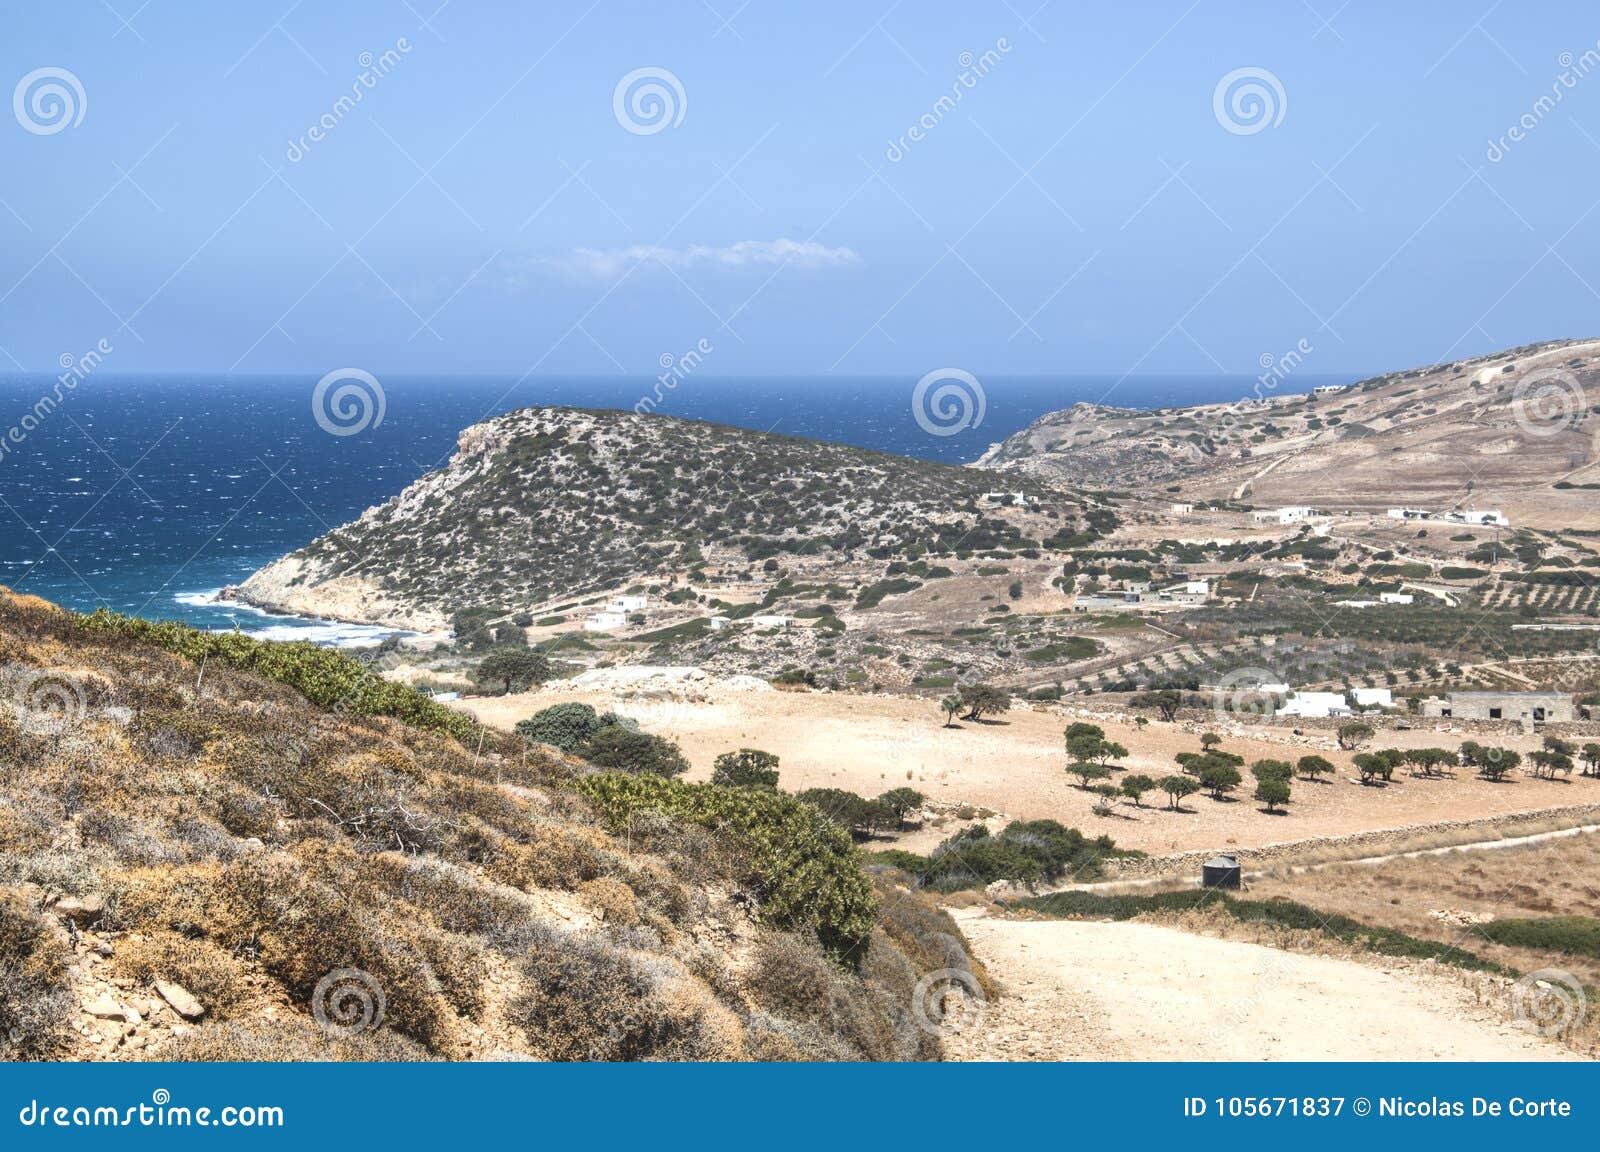 View over Antiparos island, Greece